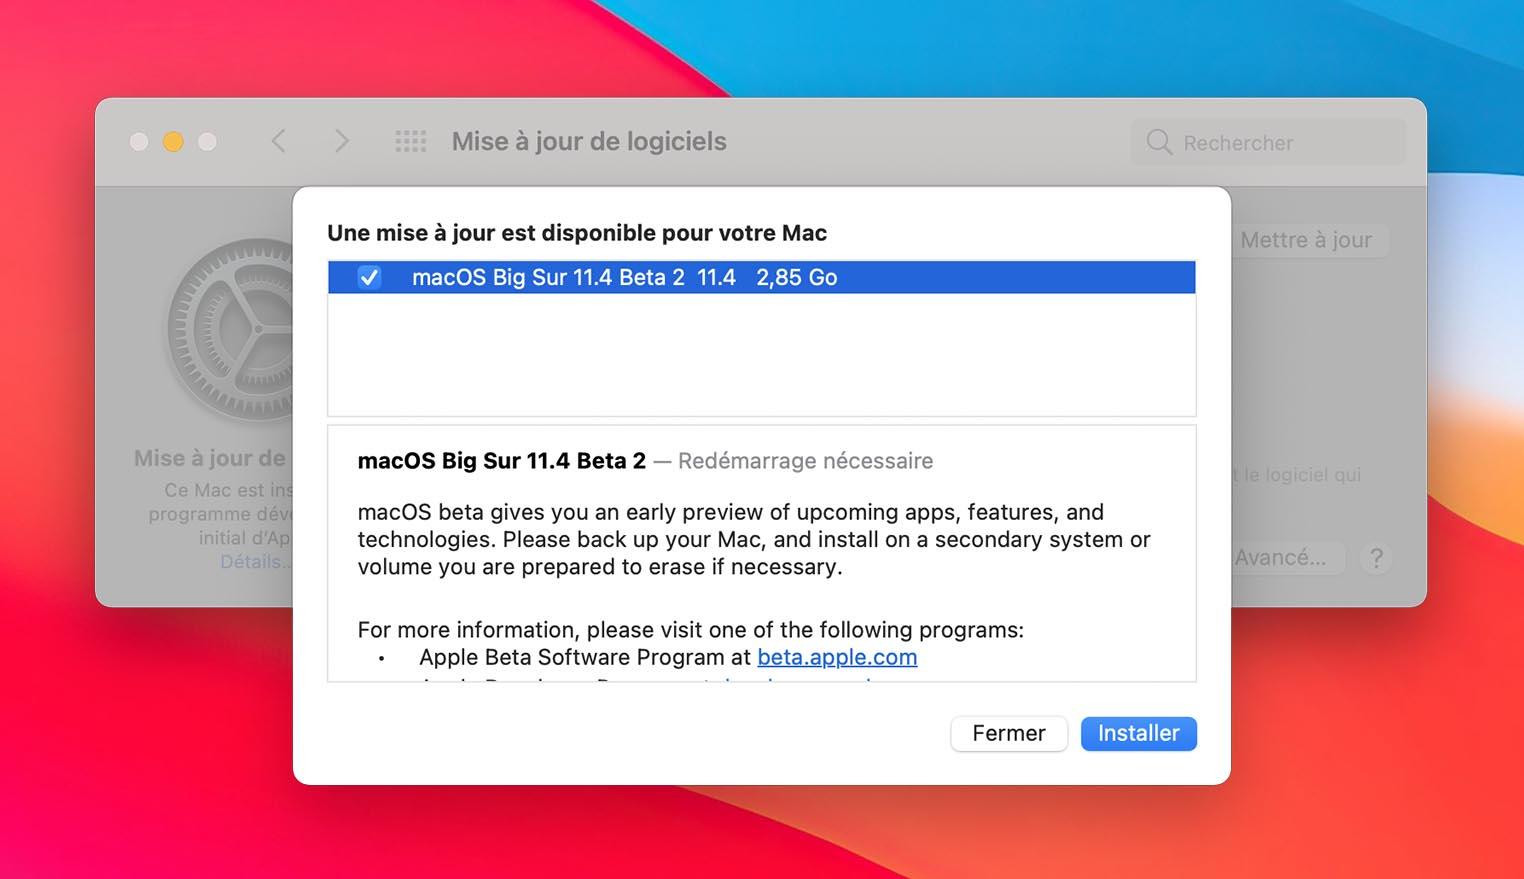 macOS 11.4 Bêta 2